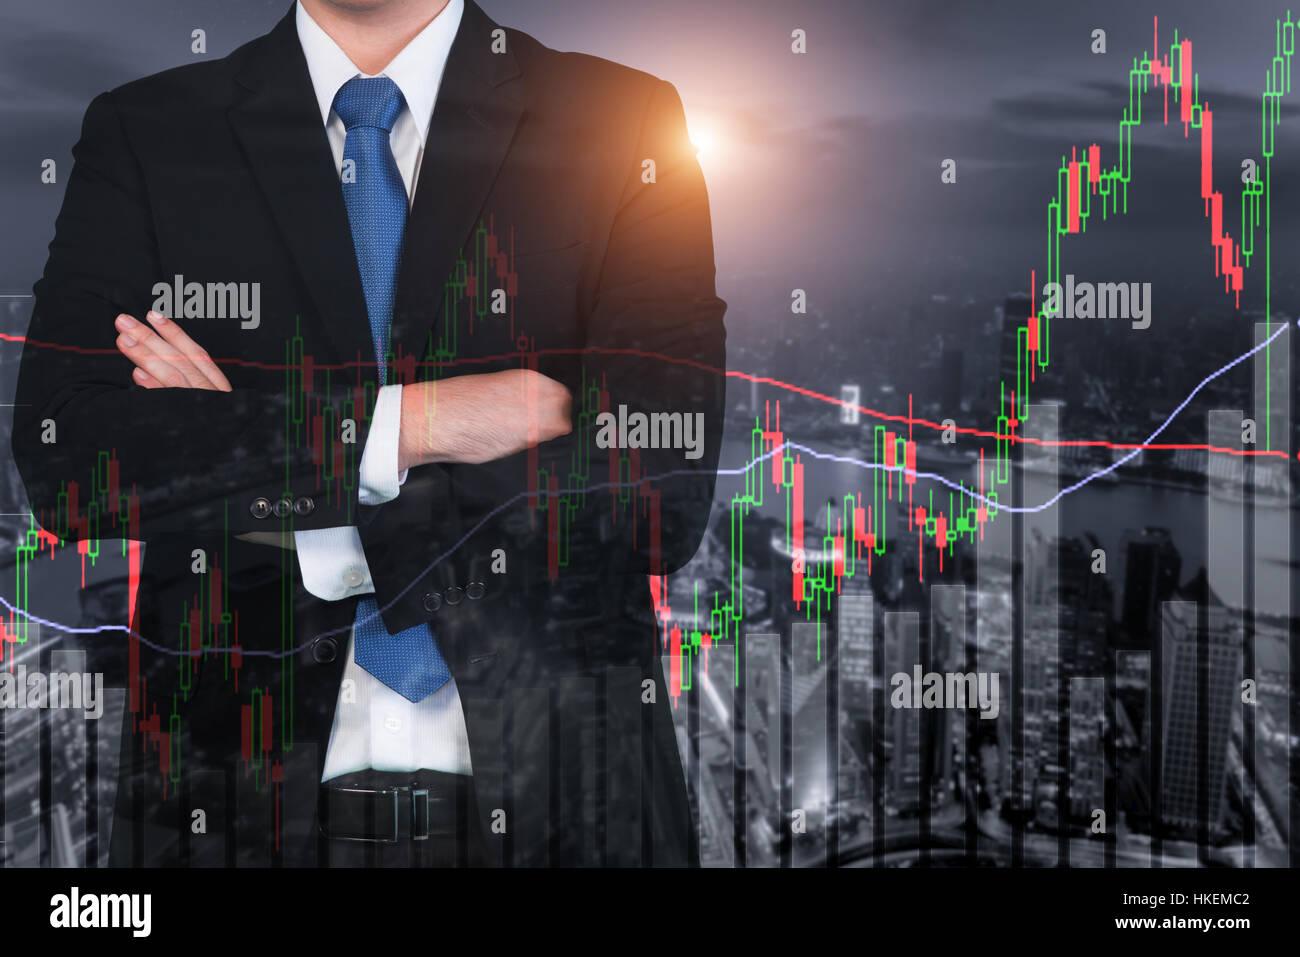 Candlestick-Chart-Muster Aufwärtstrend, Börse Shanghai Stadtbild bei Nacht Hintergrund Stockfoto